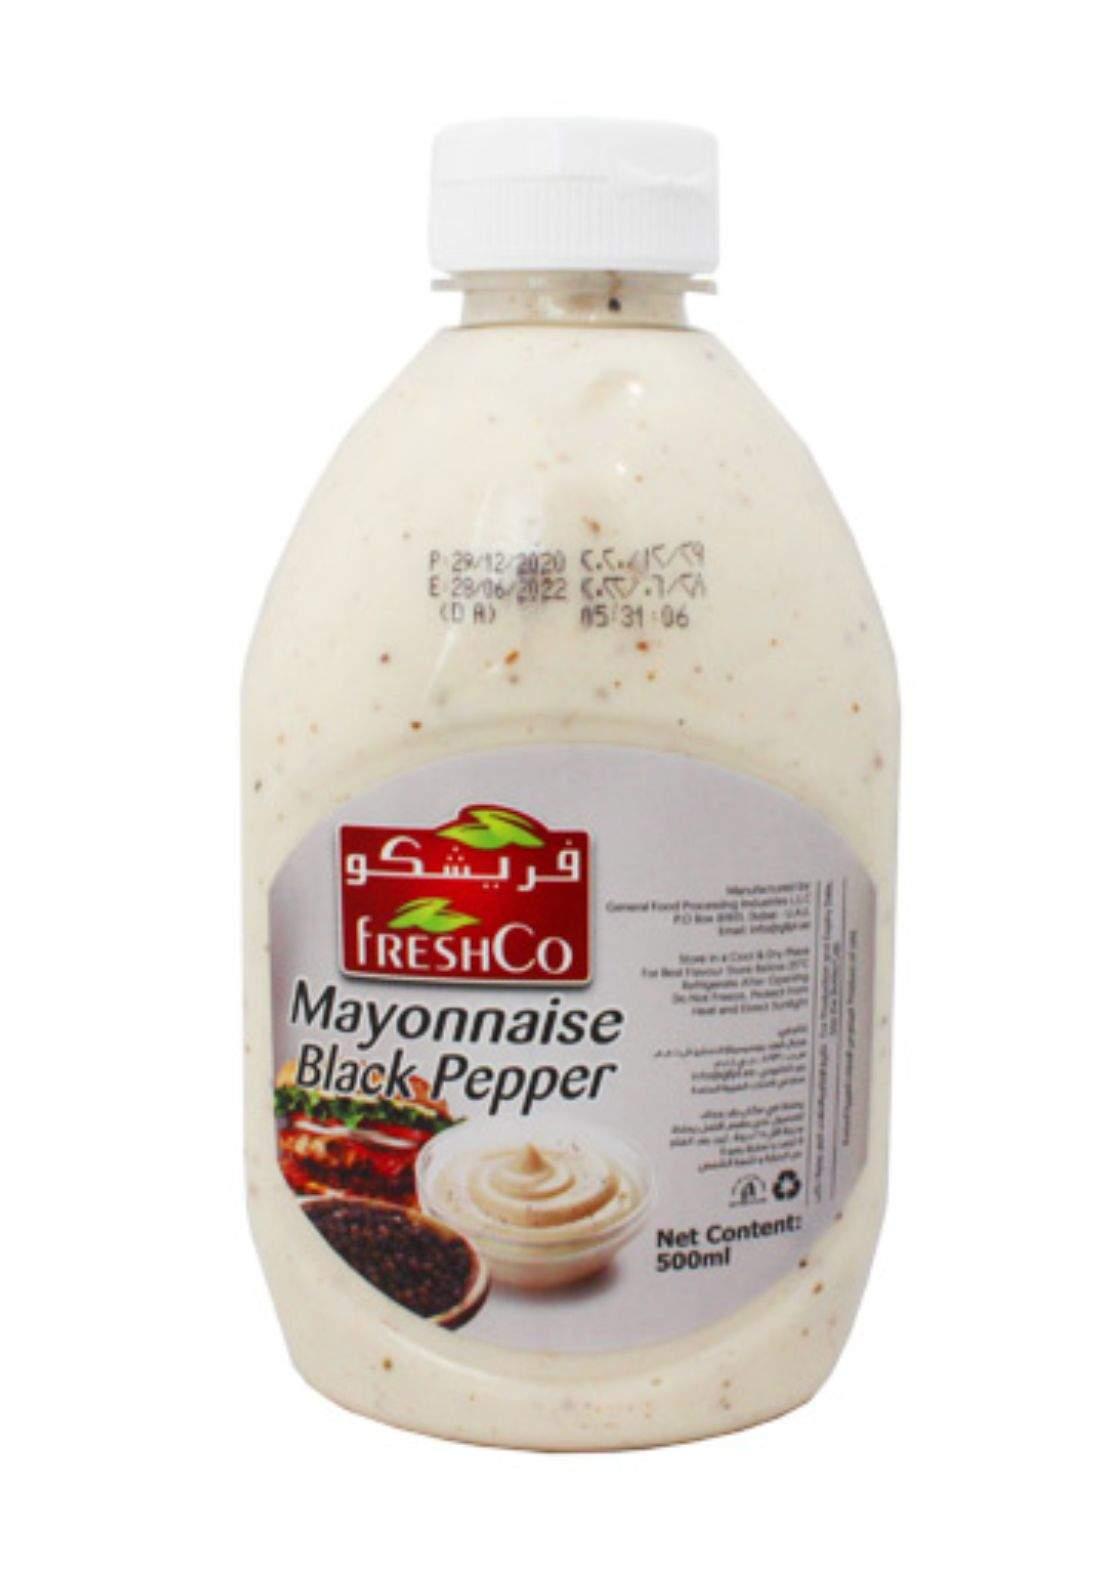 FreshCo Mayonnaise with Black Pepper فريشكو مايونيز بالفلفل الأسود